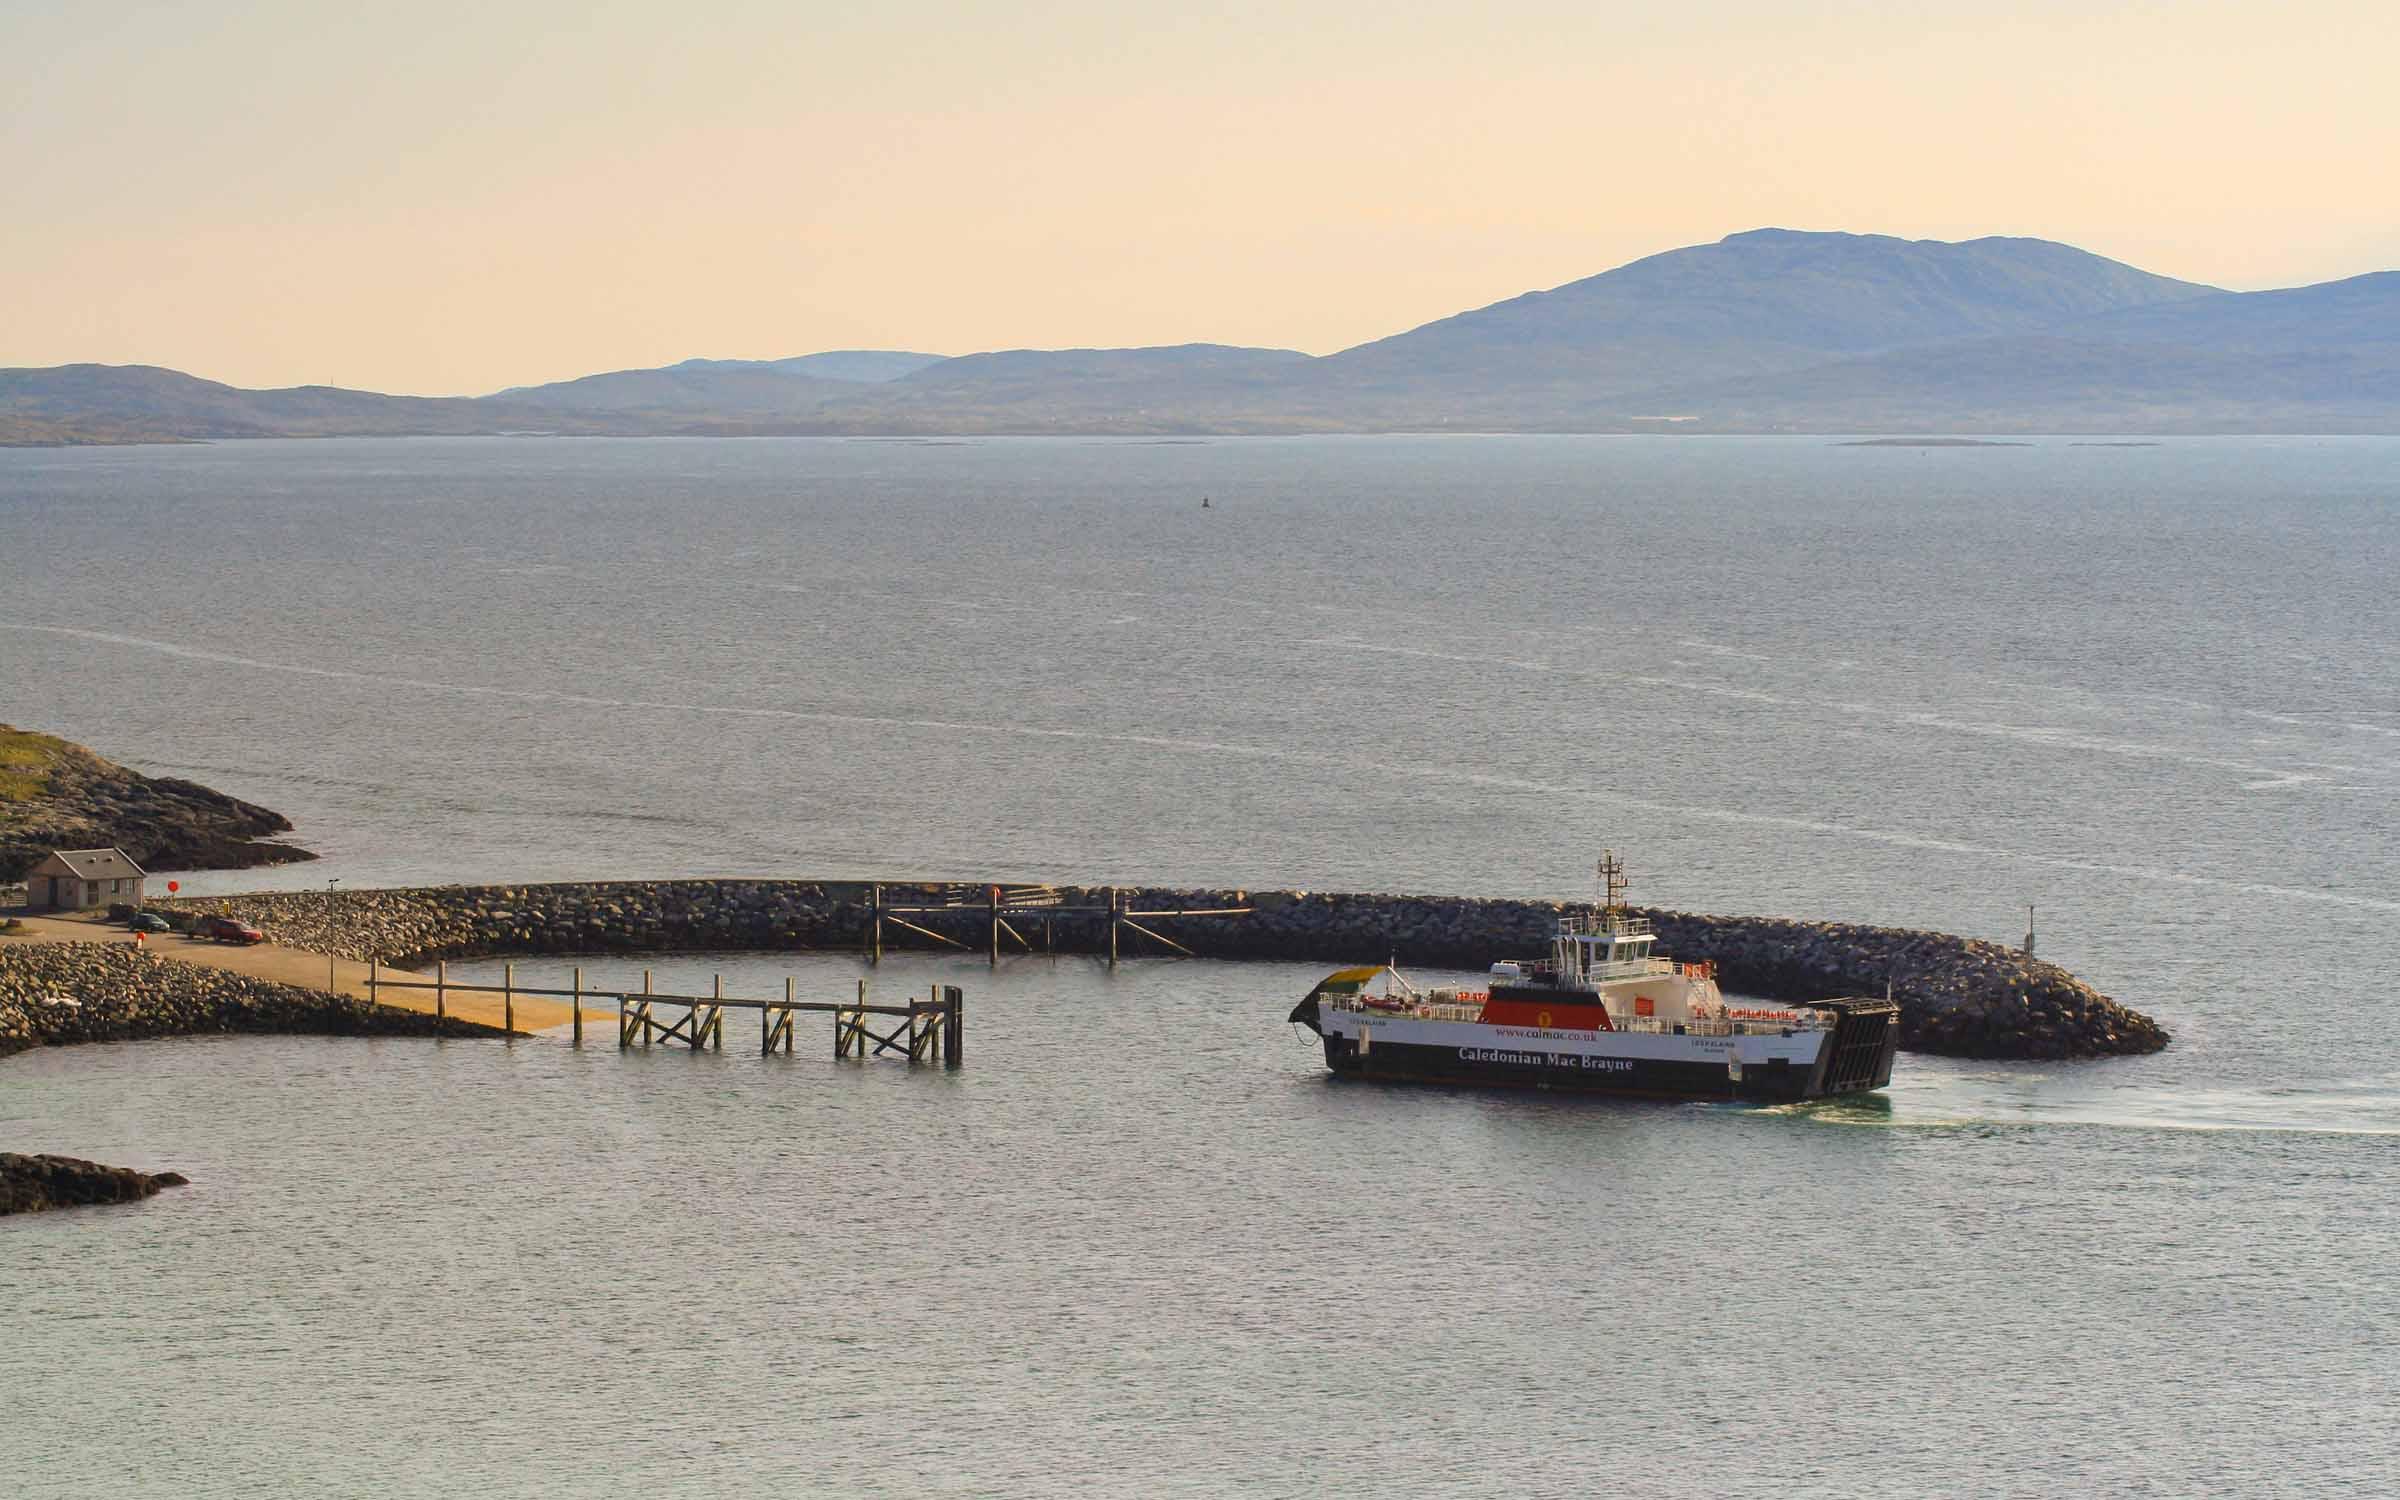 Loch Alainn arriving at Eriskay (Ships of CalMac)